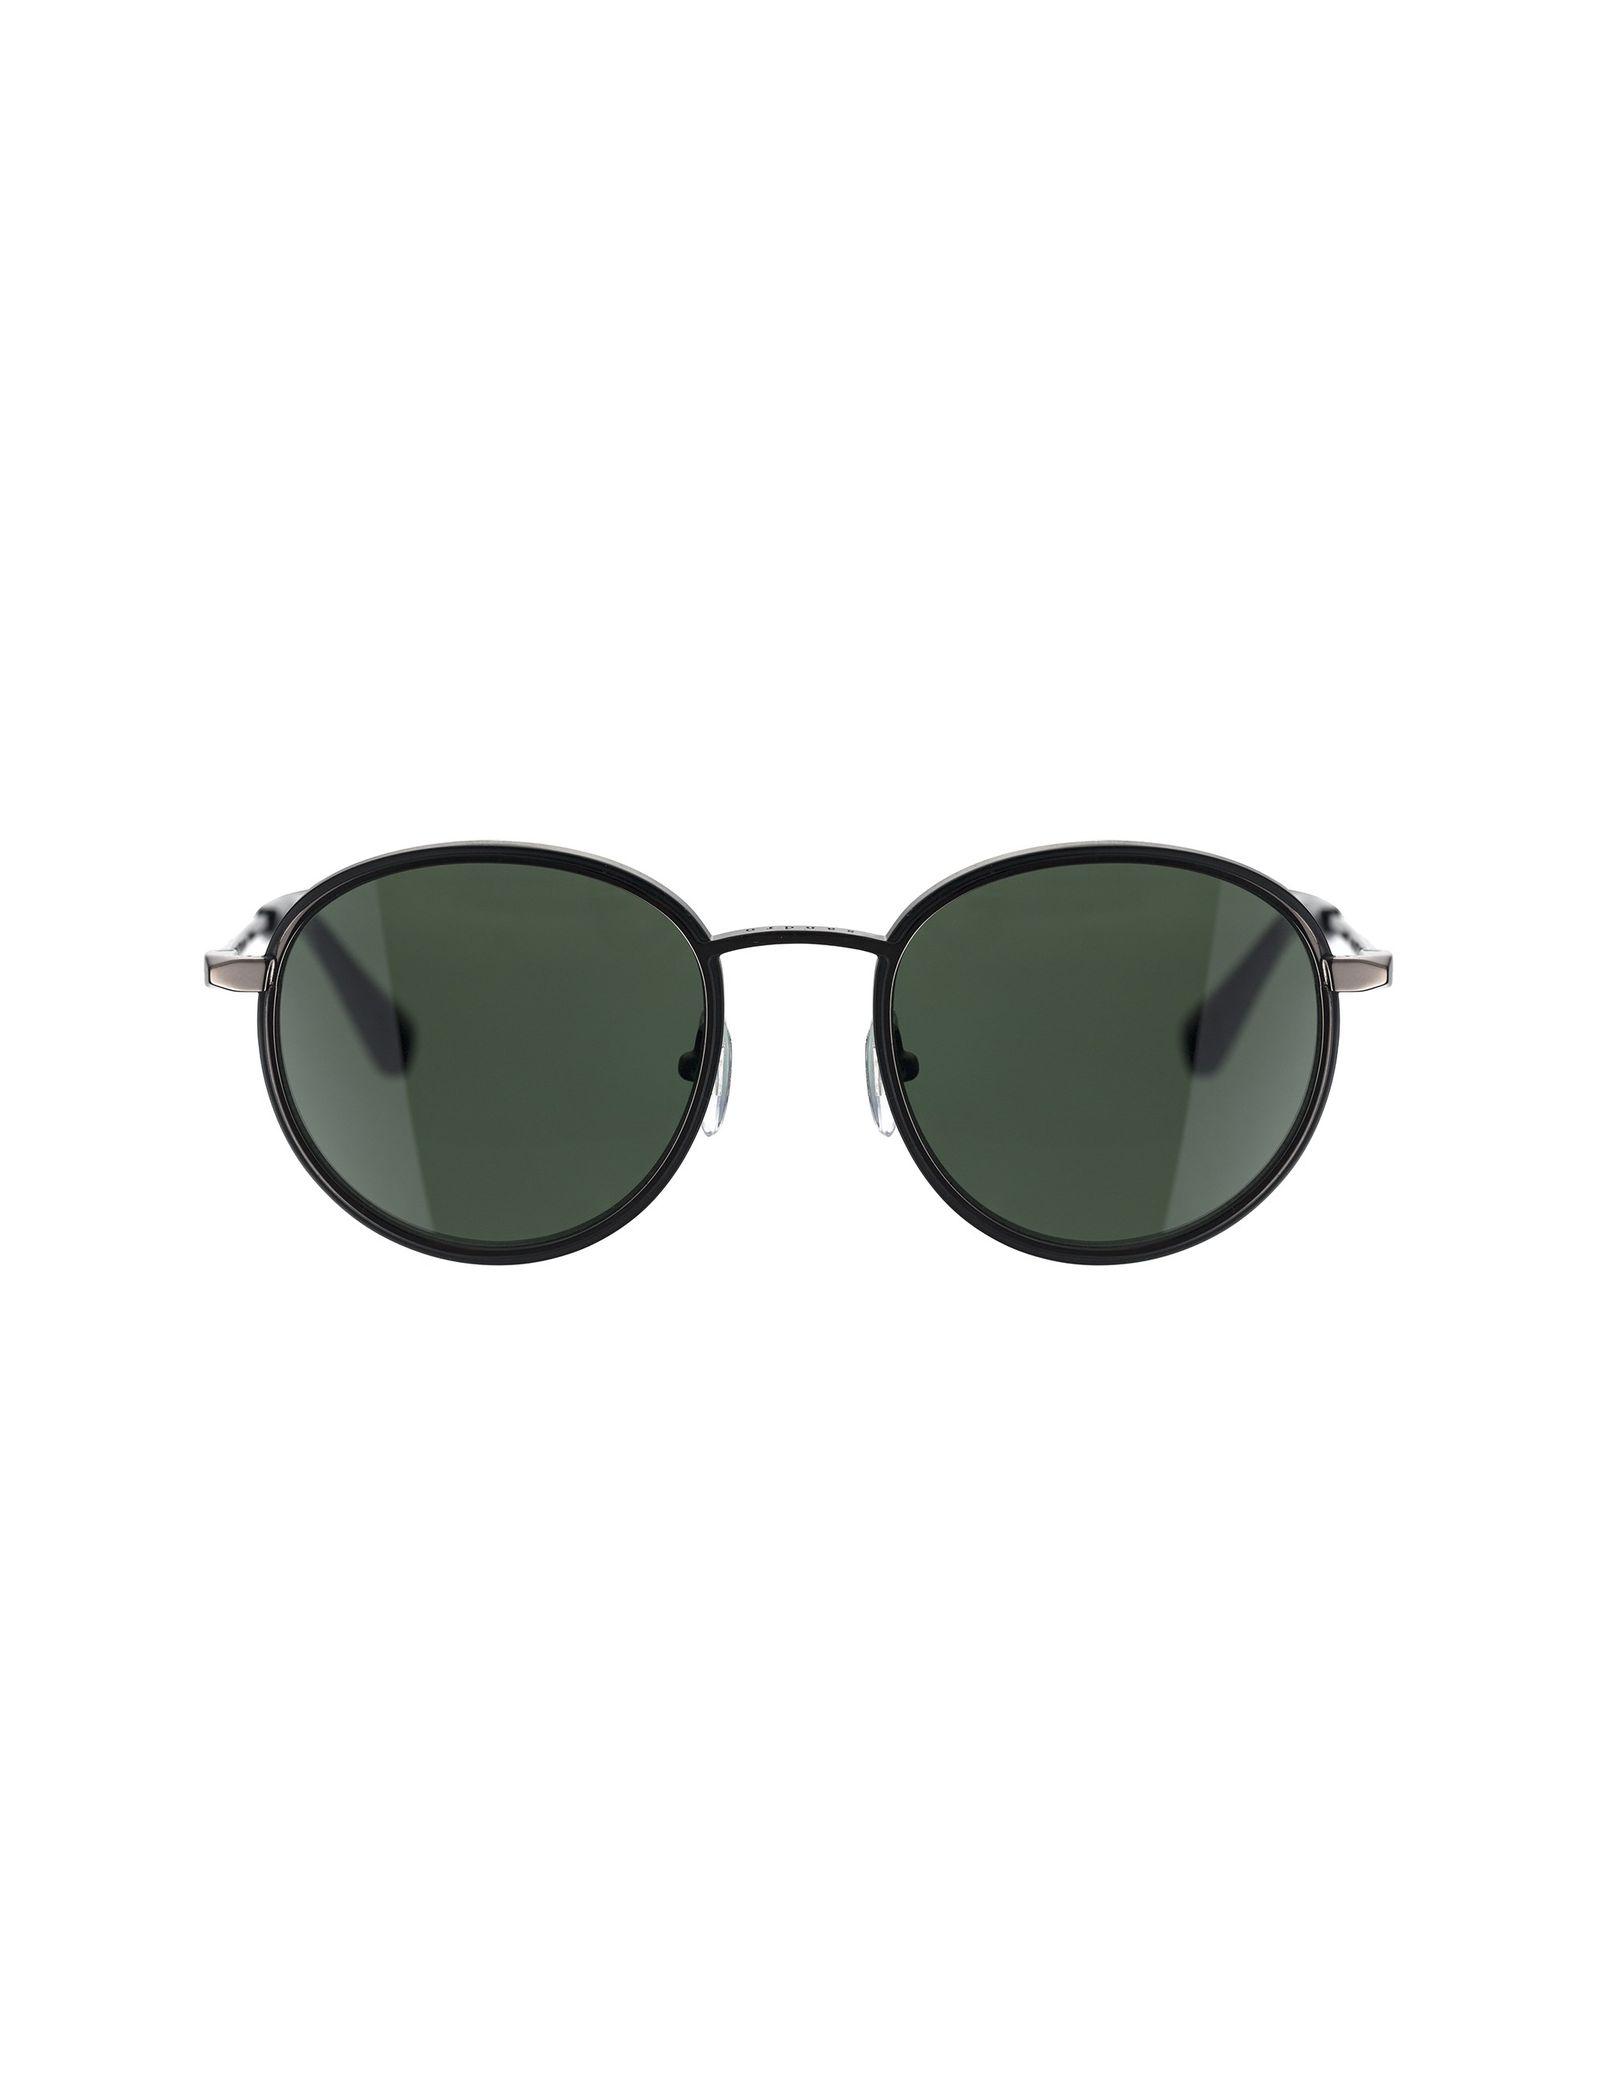 عینک آفتابی گرد زنانه - ساندرو - زغالي      - 1